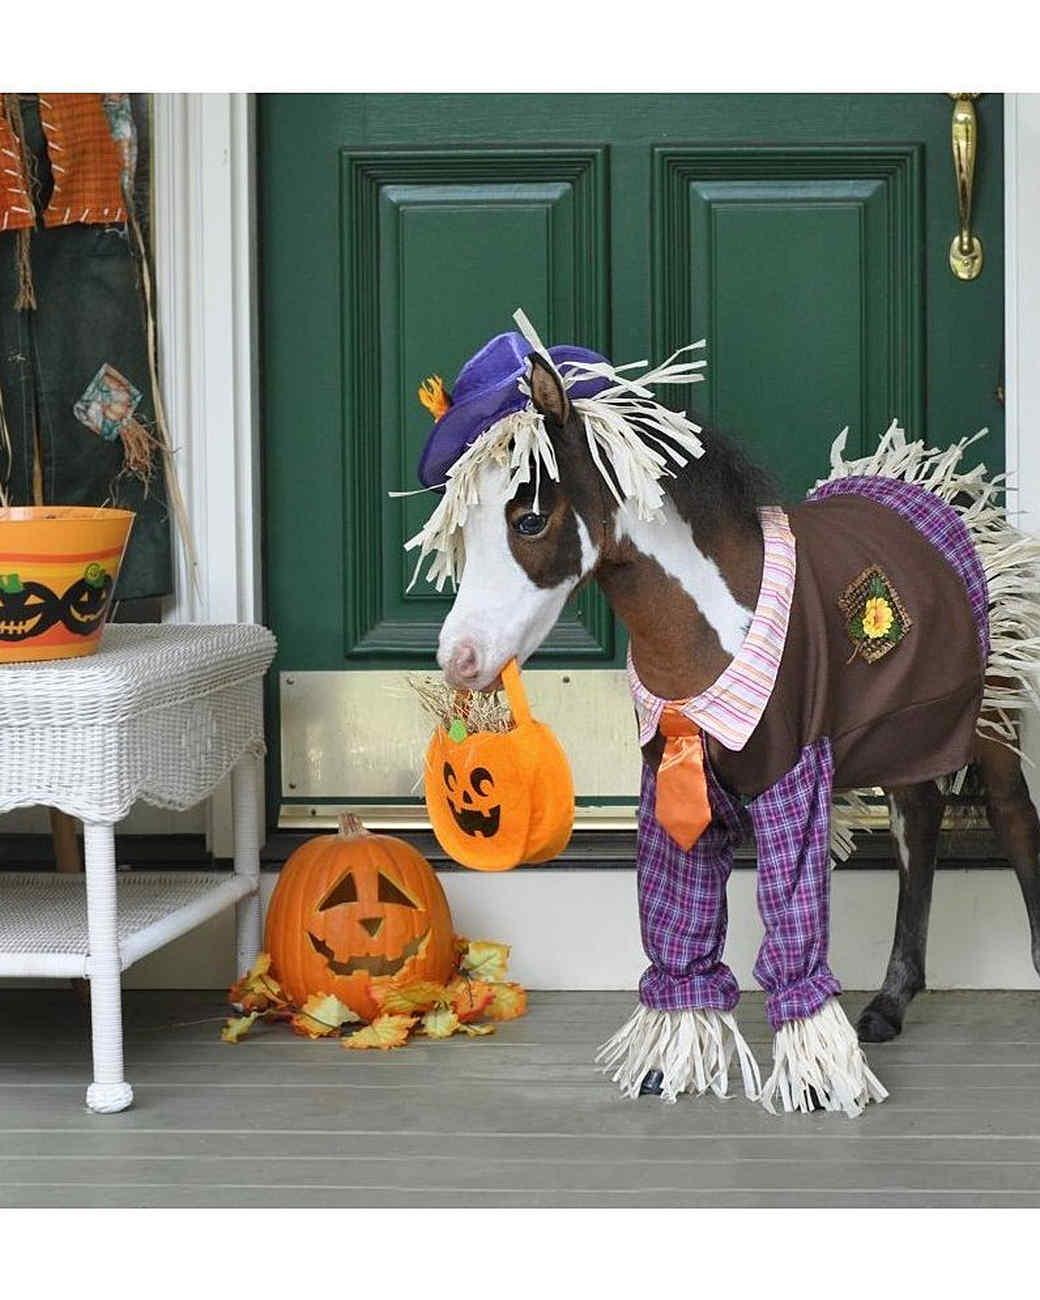 ugc-halloween-1011-gentlecarousel-6-15131203.jpg